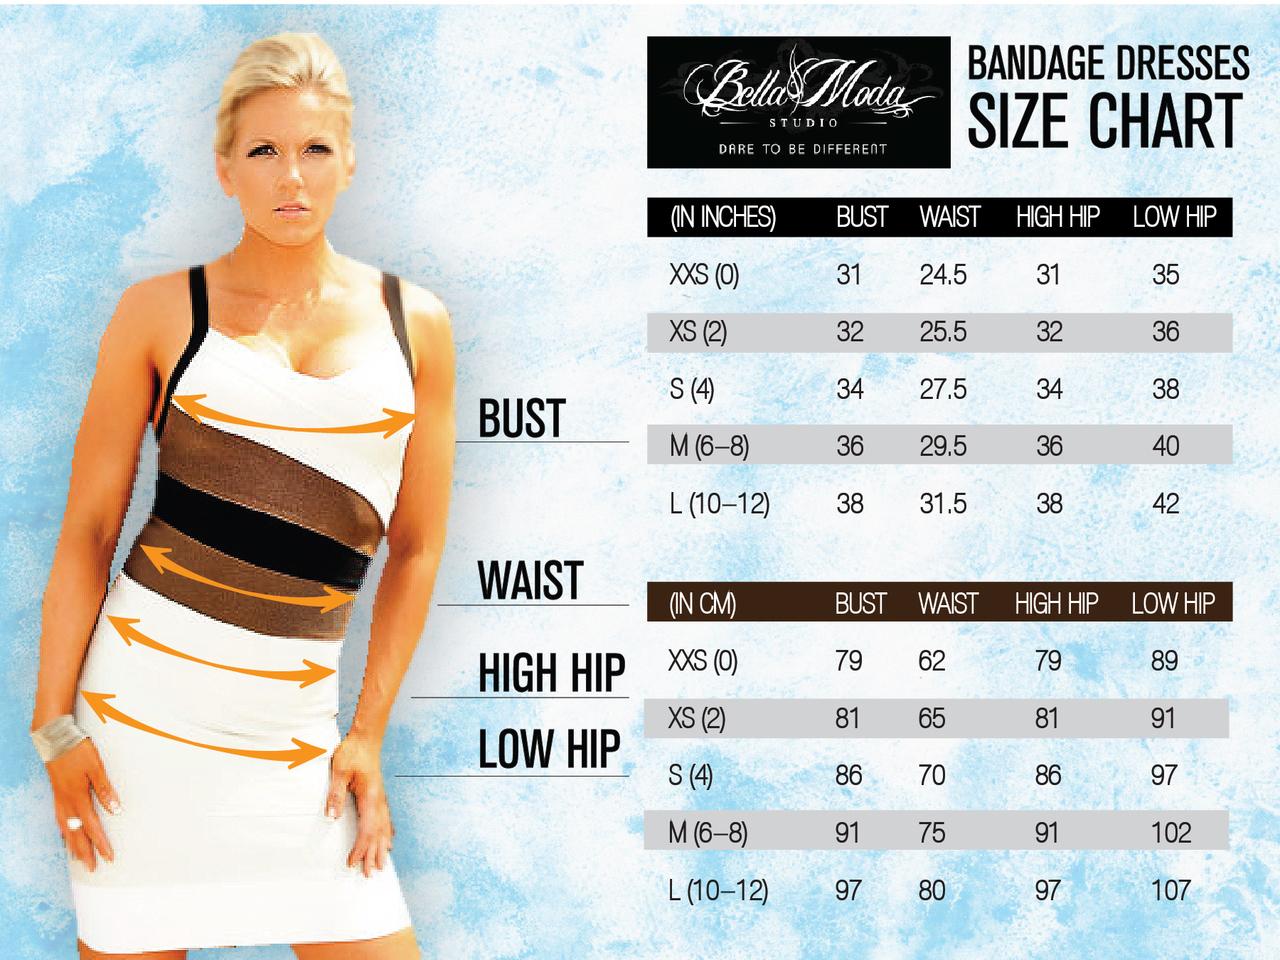 SMALL - Black & White Strapless Leatherette Celeb Inspired Bandage Dress -LAST ONE